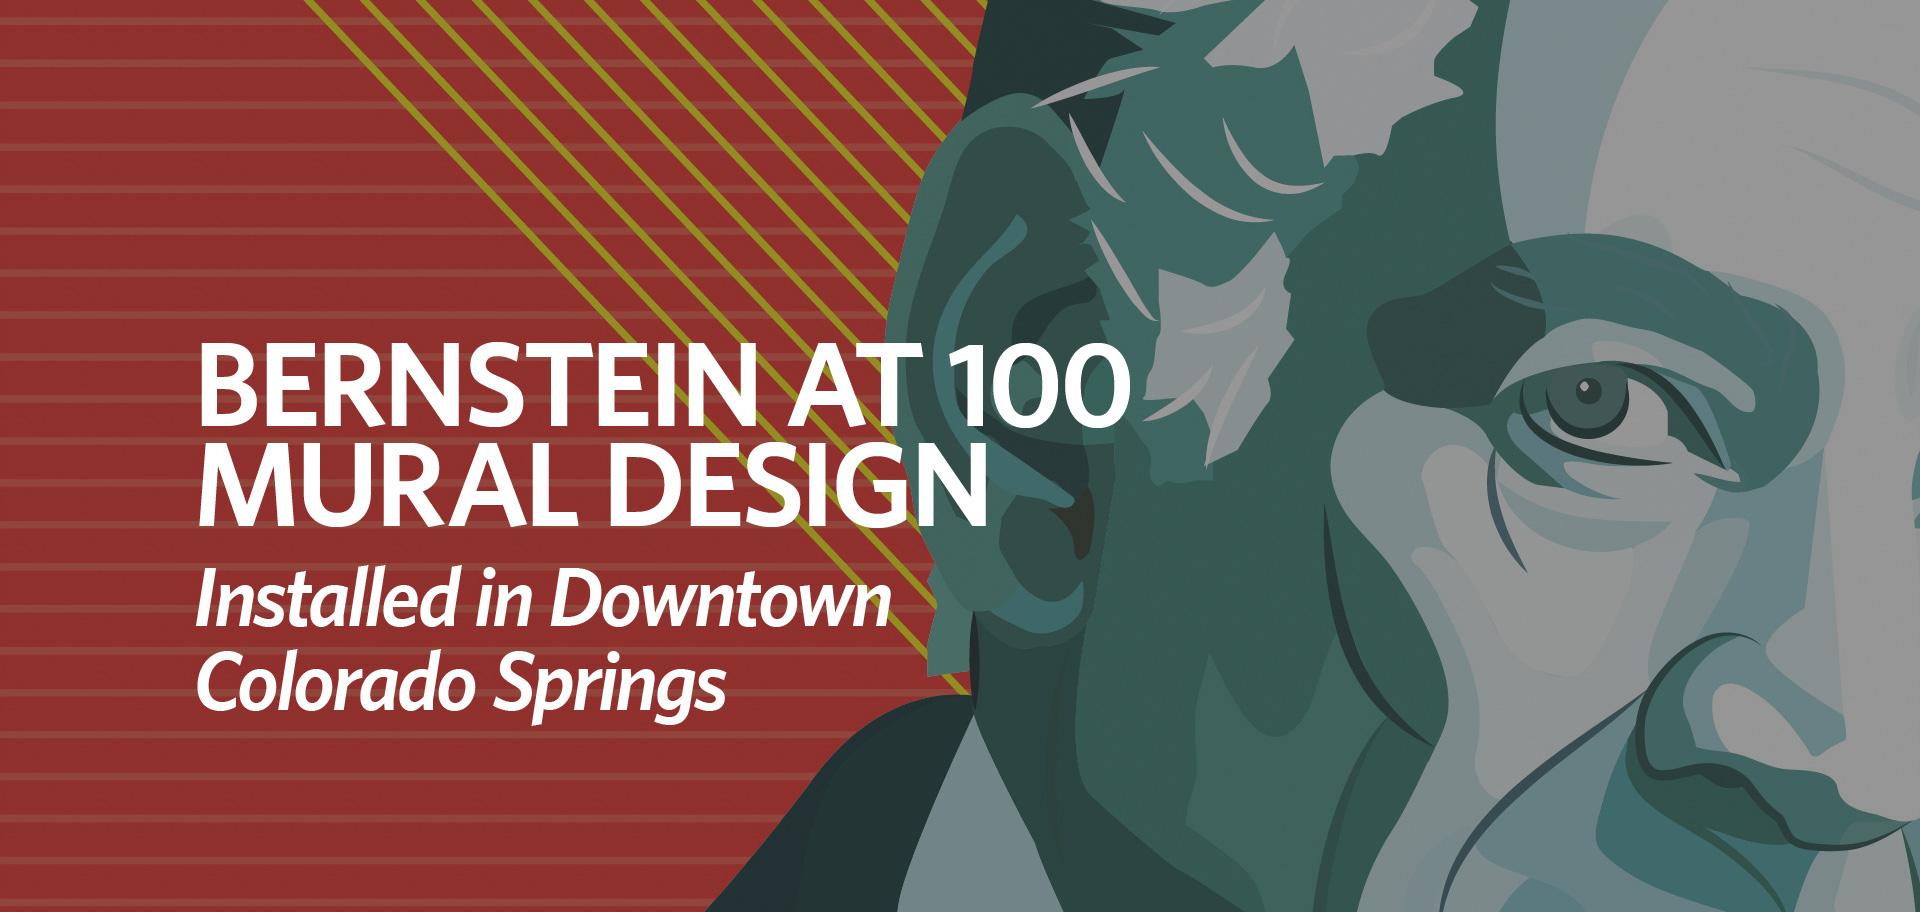 Bernstein at 100 mural design, Kettle Fire Creative, downtown Colorado Springs, public art, Leonard Bernstein face bernstein Bernstein at 100 Mural Design Installed in Downtown Colorado Springs bernstein blog fi